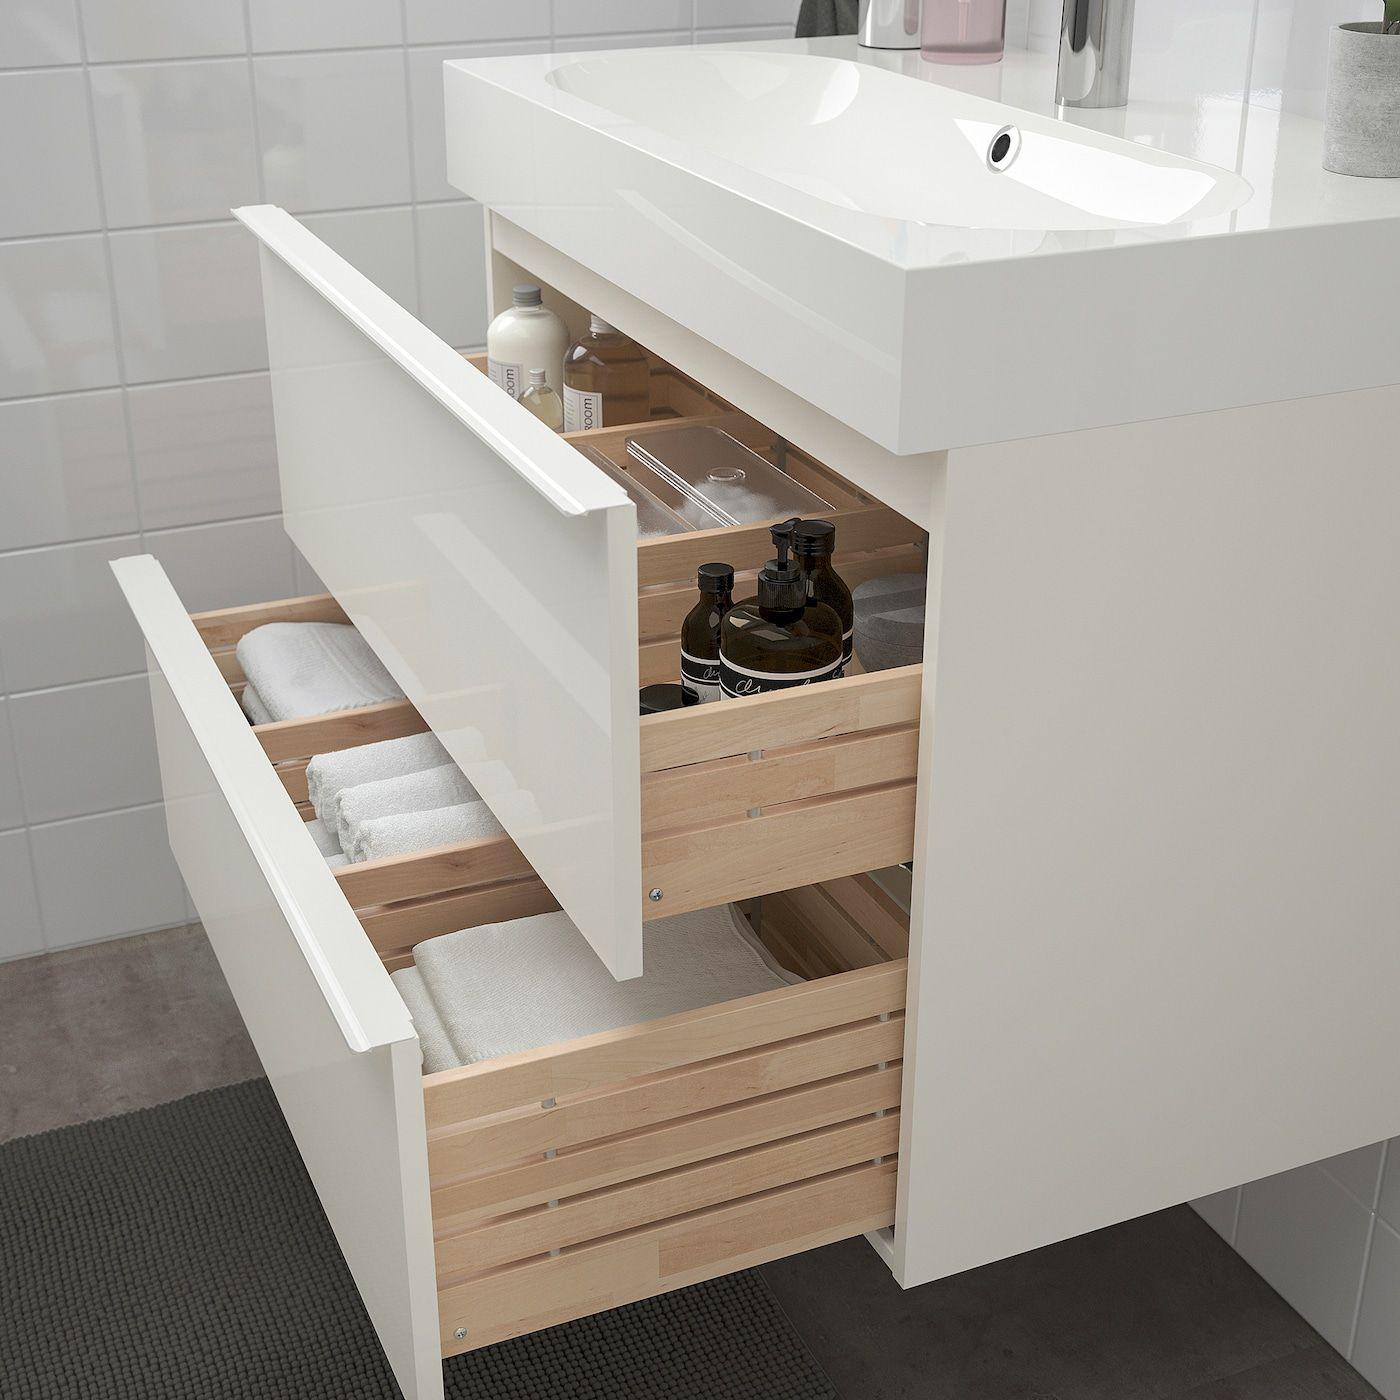 Godmorgon Bråviken Bathroom Vanity High Gloss White Brogrund Faucet Ikea In 2021 Ikea Godmorgon Sink Cabinet Ikea